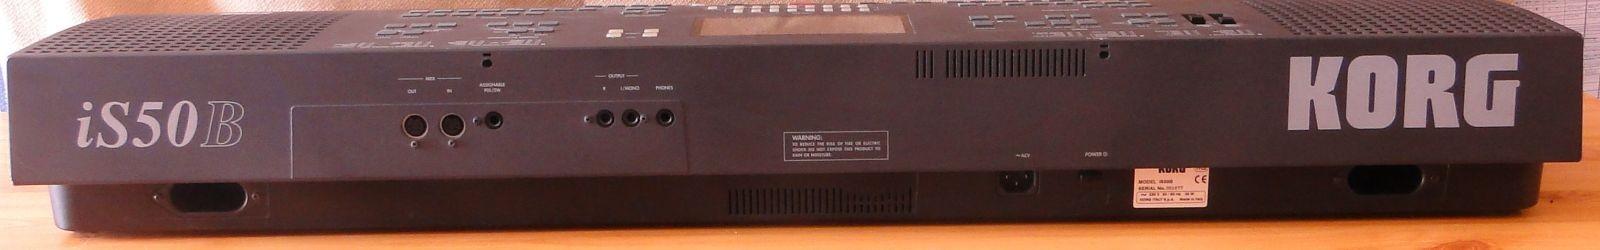 DSC06146.JPG (1600×250)